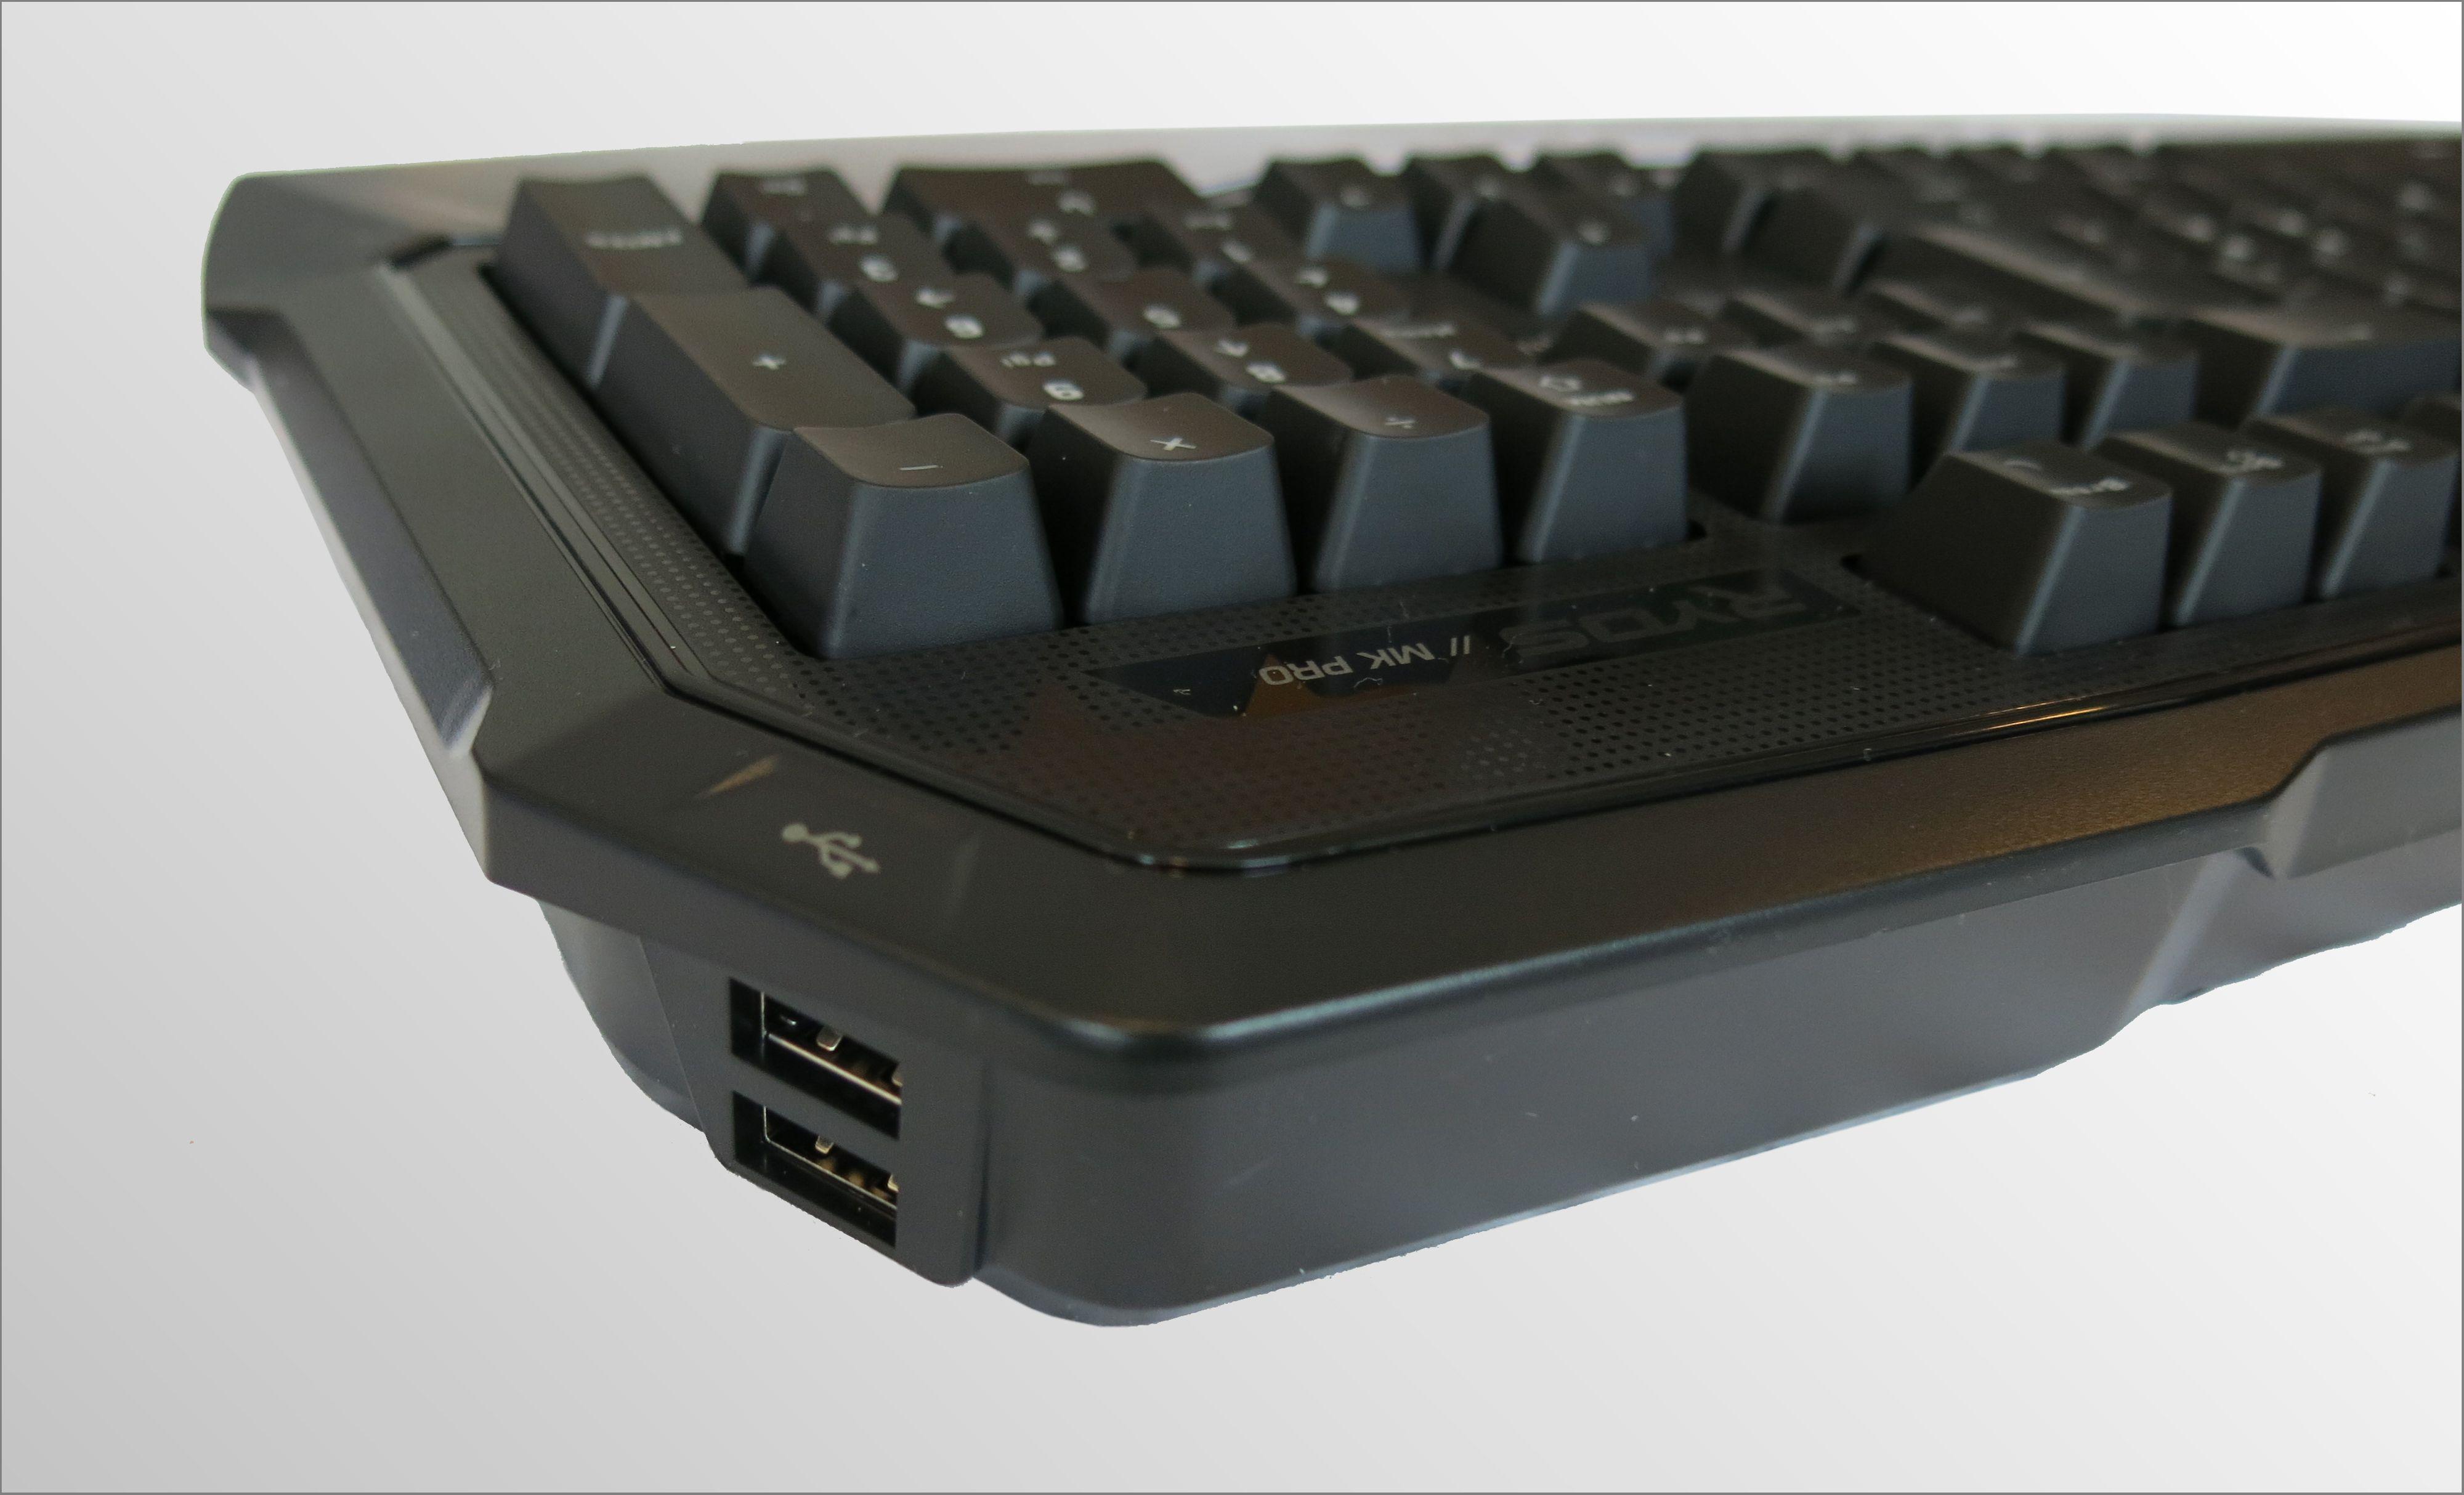 To USB 2.0 porter har fått sin plass på høyresiden av tastaturet. Foto: Torstein Sørnes, Hardware.no